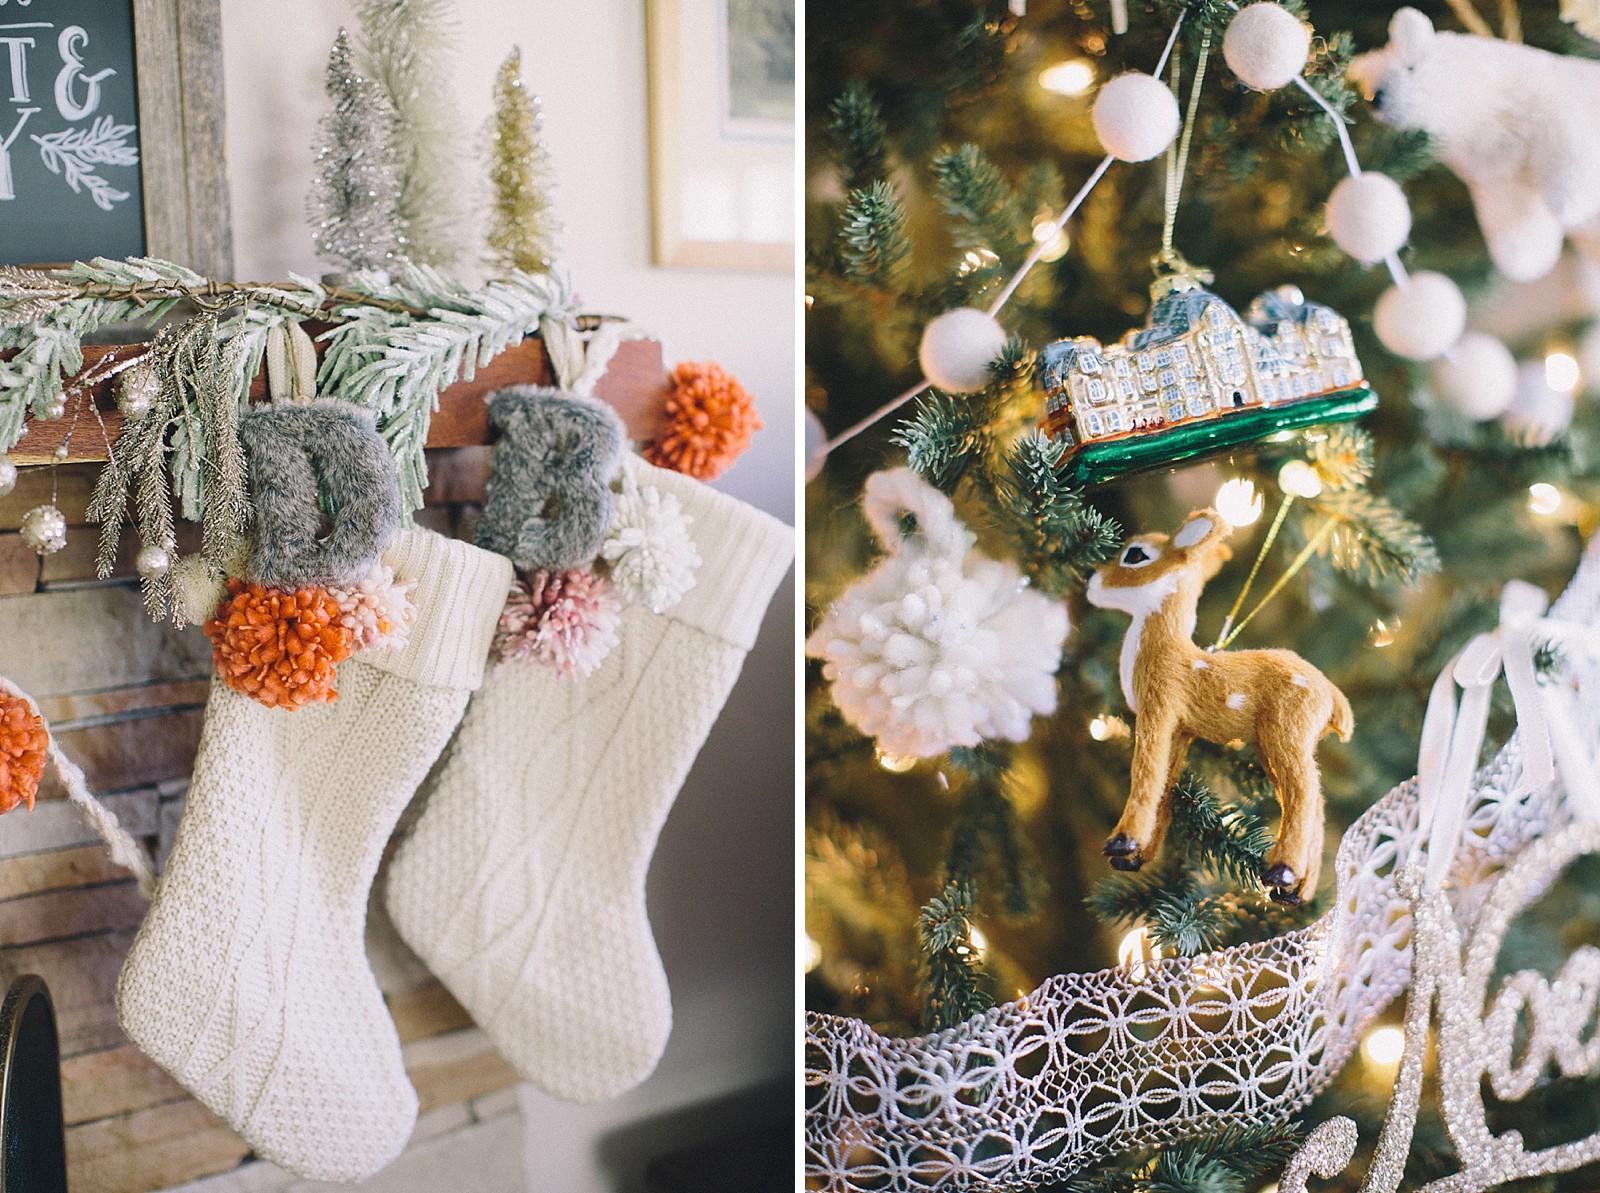 pottery-barn-fur-winter-wonderland-christmas-holiday-decoration-1823